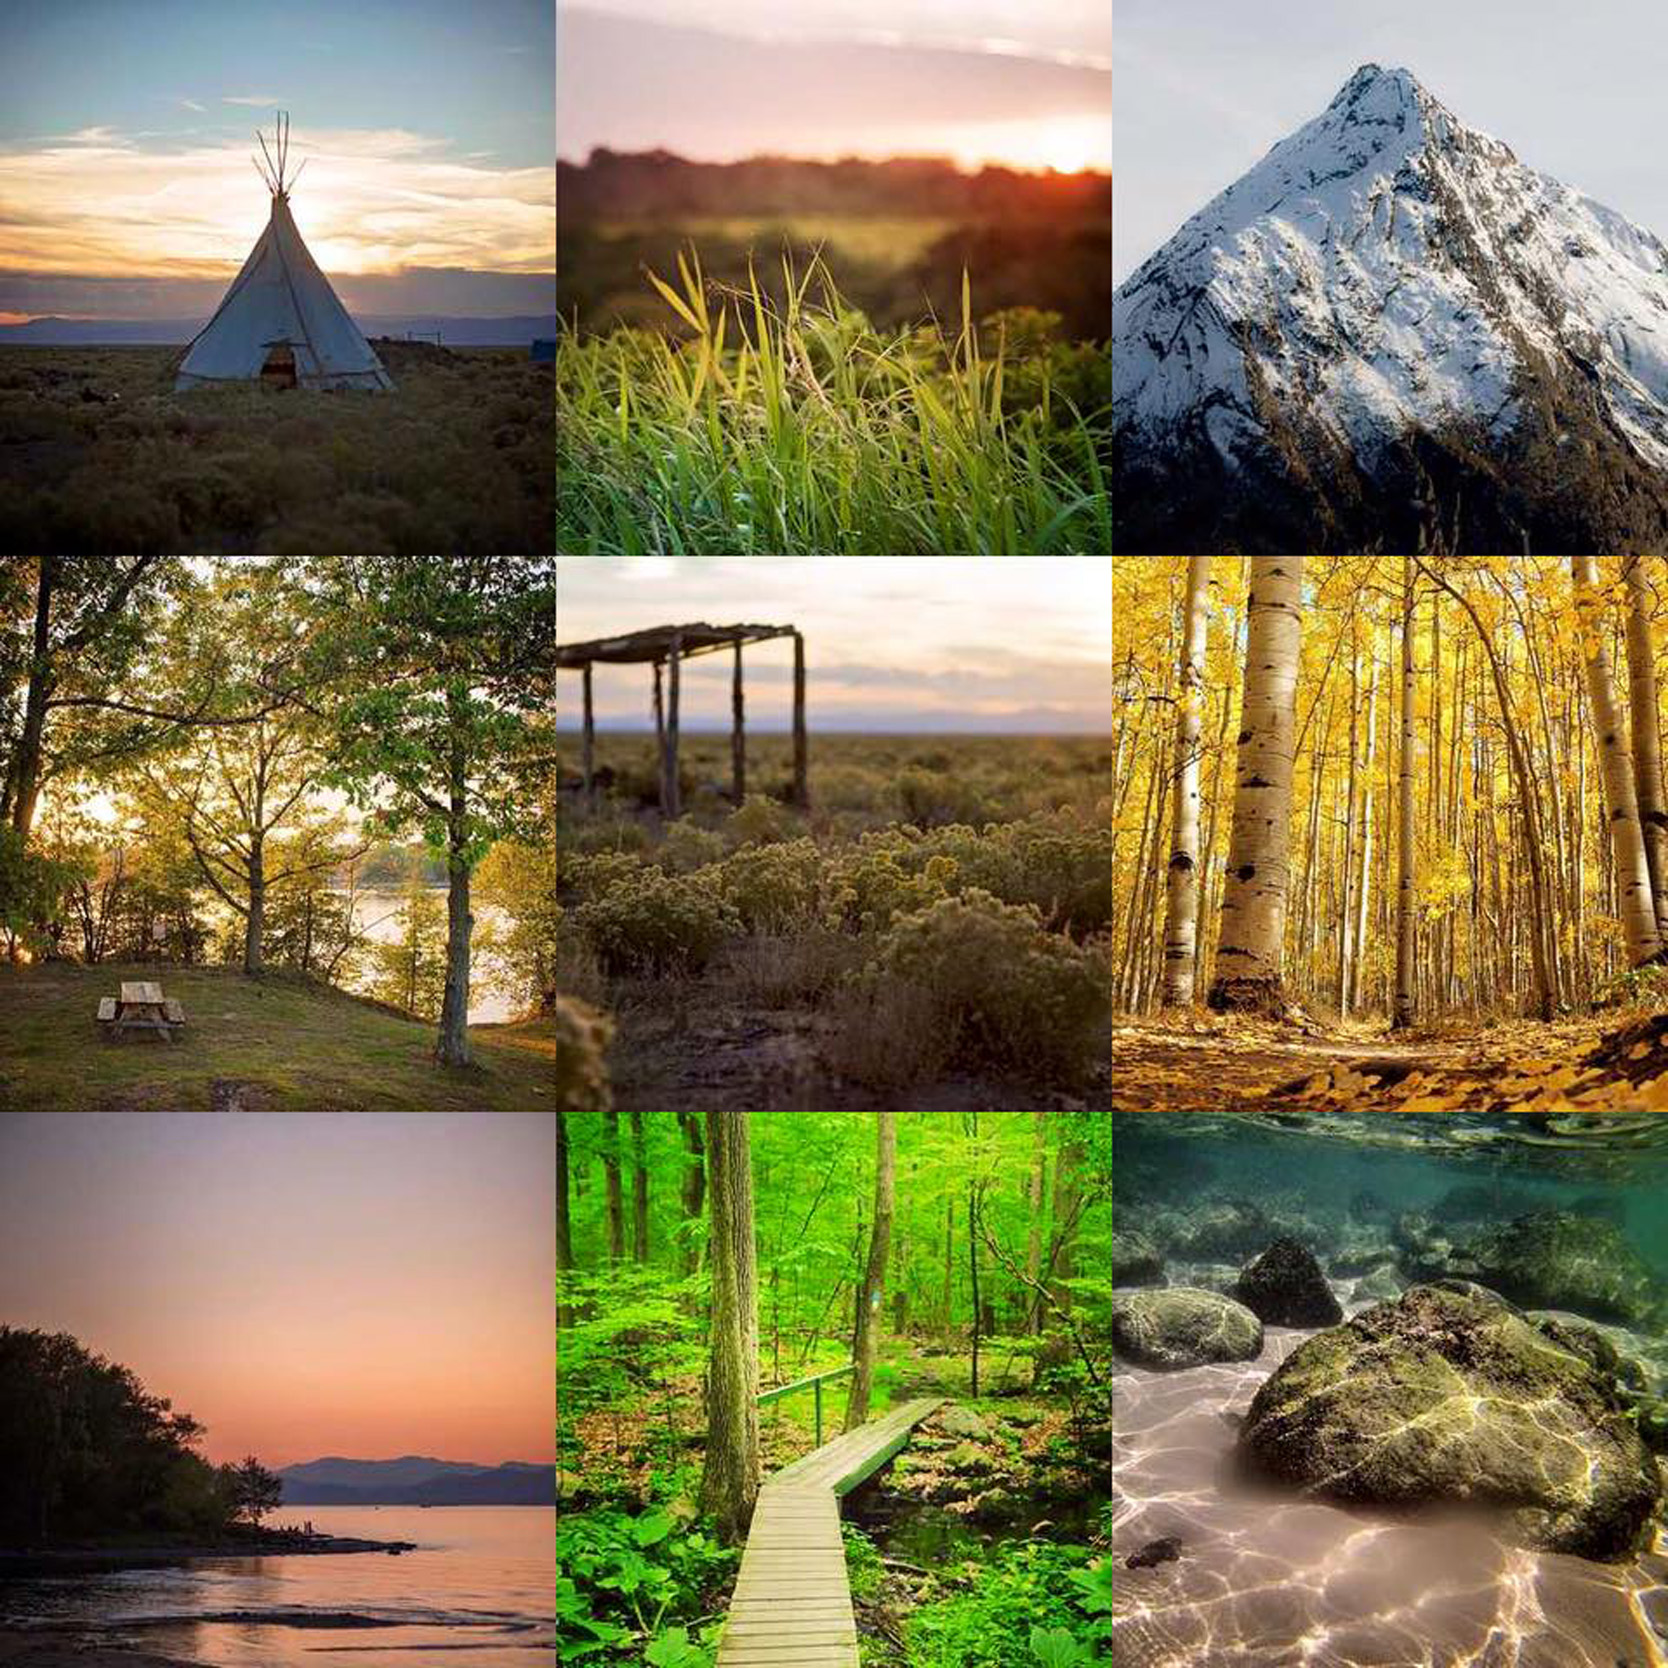 Britt_Nemeth_Studios_PhotographyNature_Spaces_Places_Vaction_Travel001.jpg